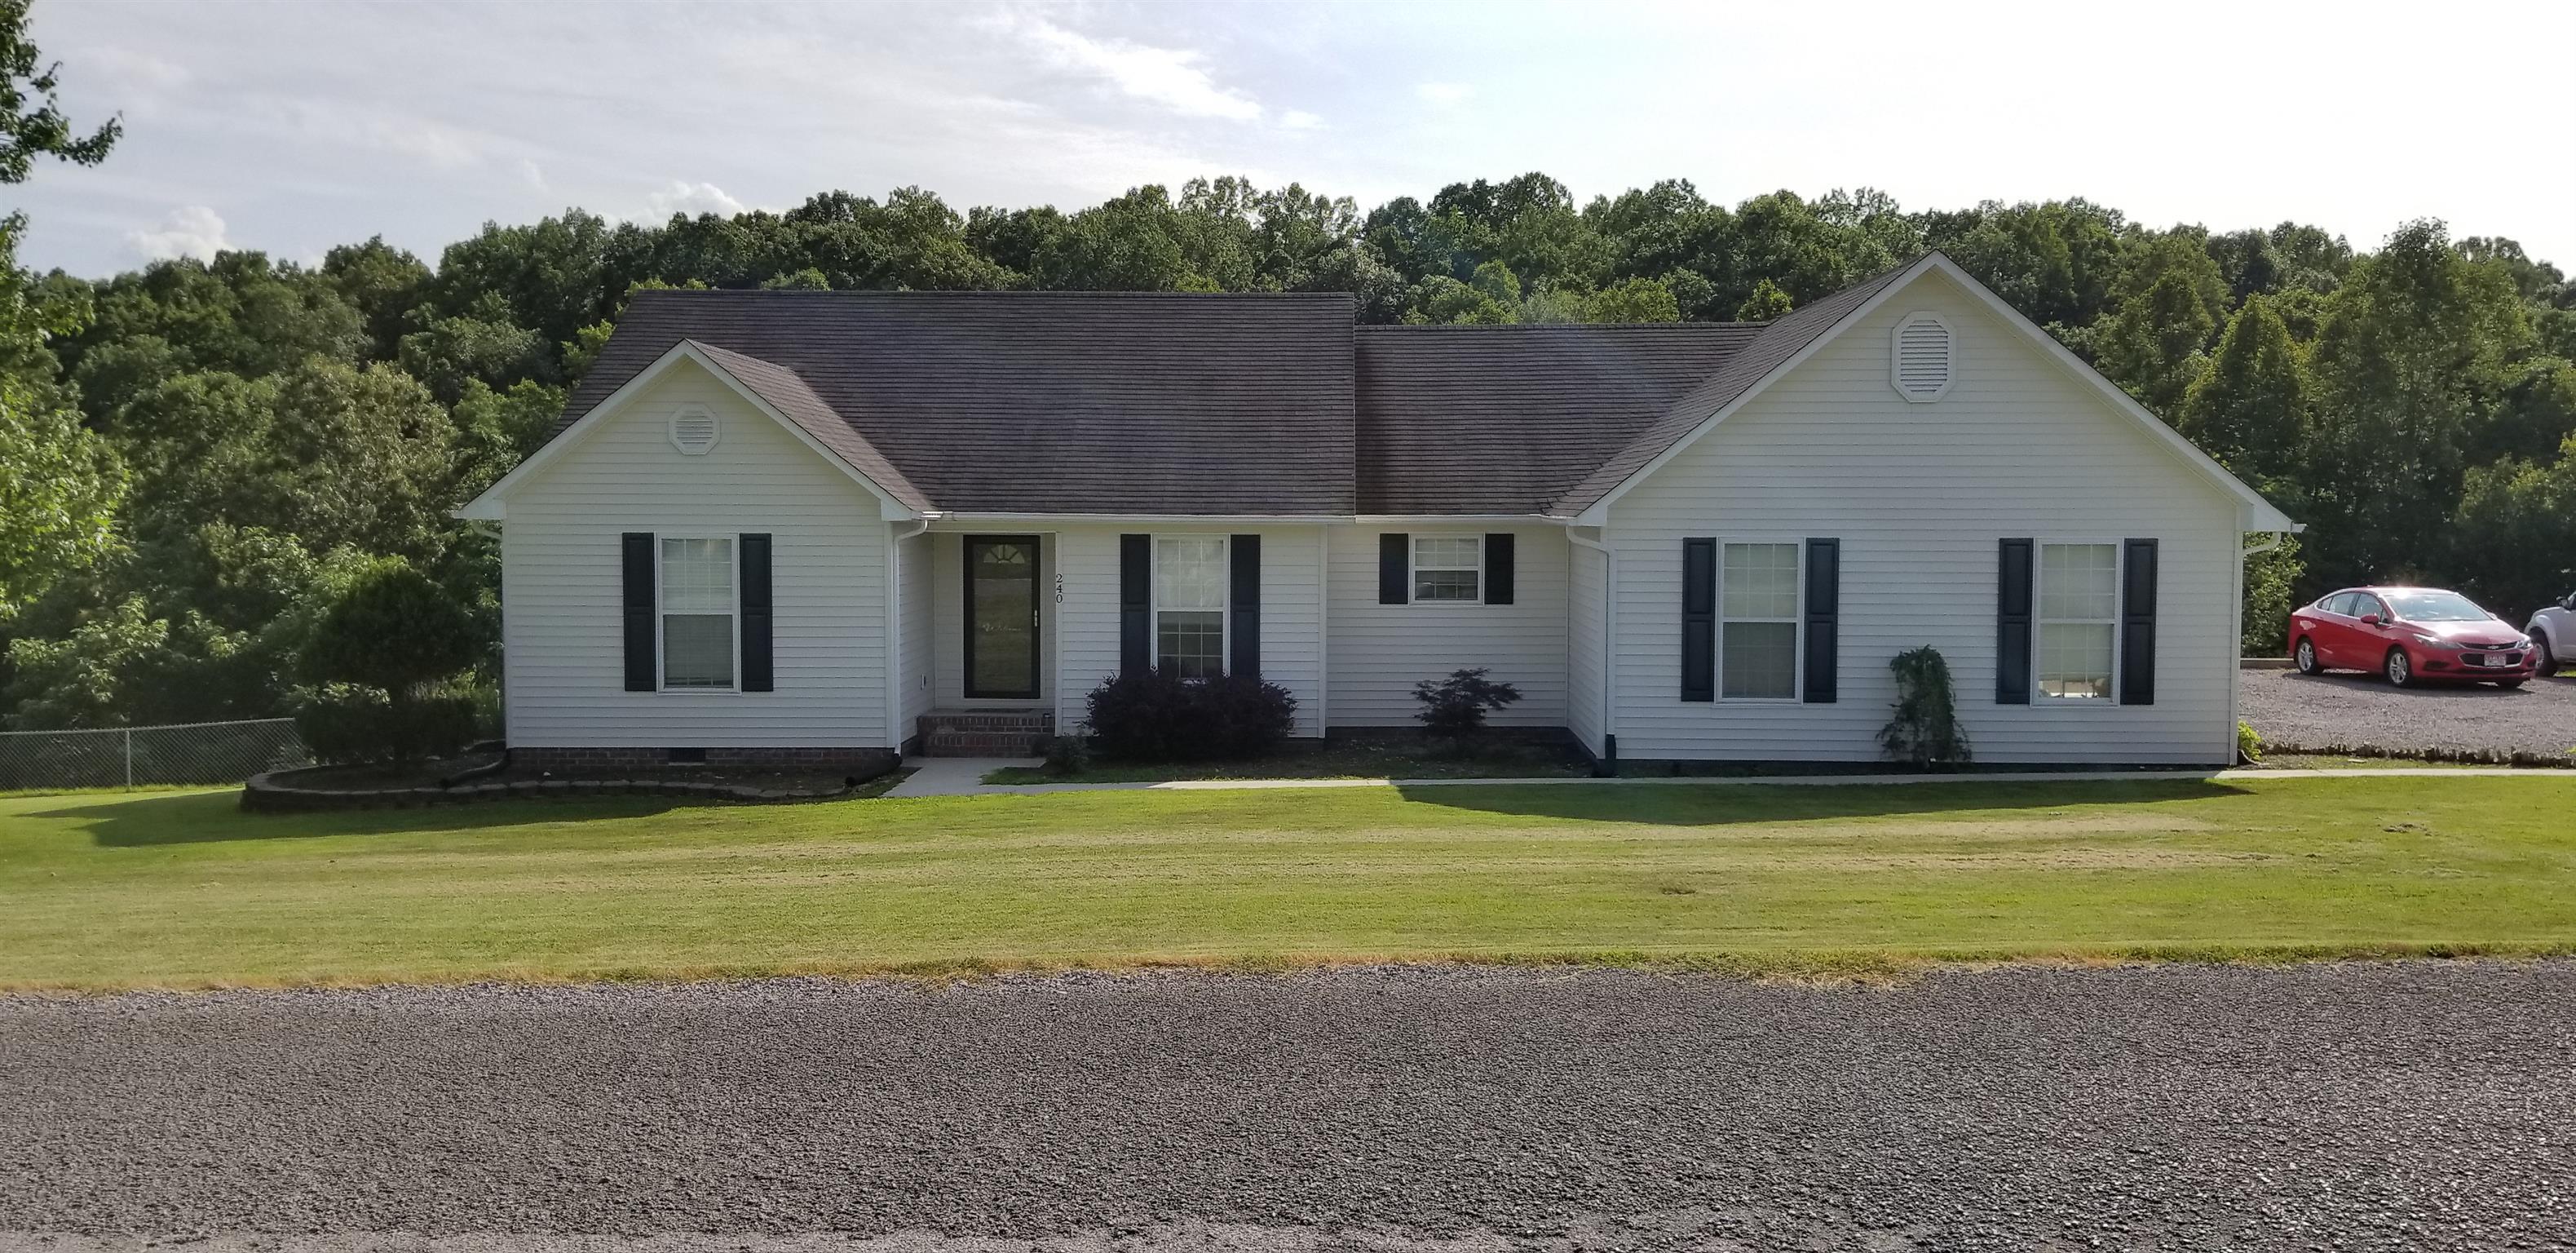 240 Grand View Dr, Smithville, TN 37166 - Smithville, TN real estate listing